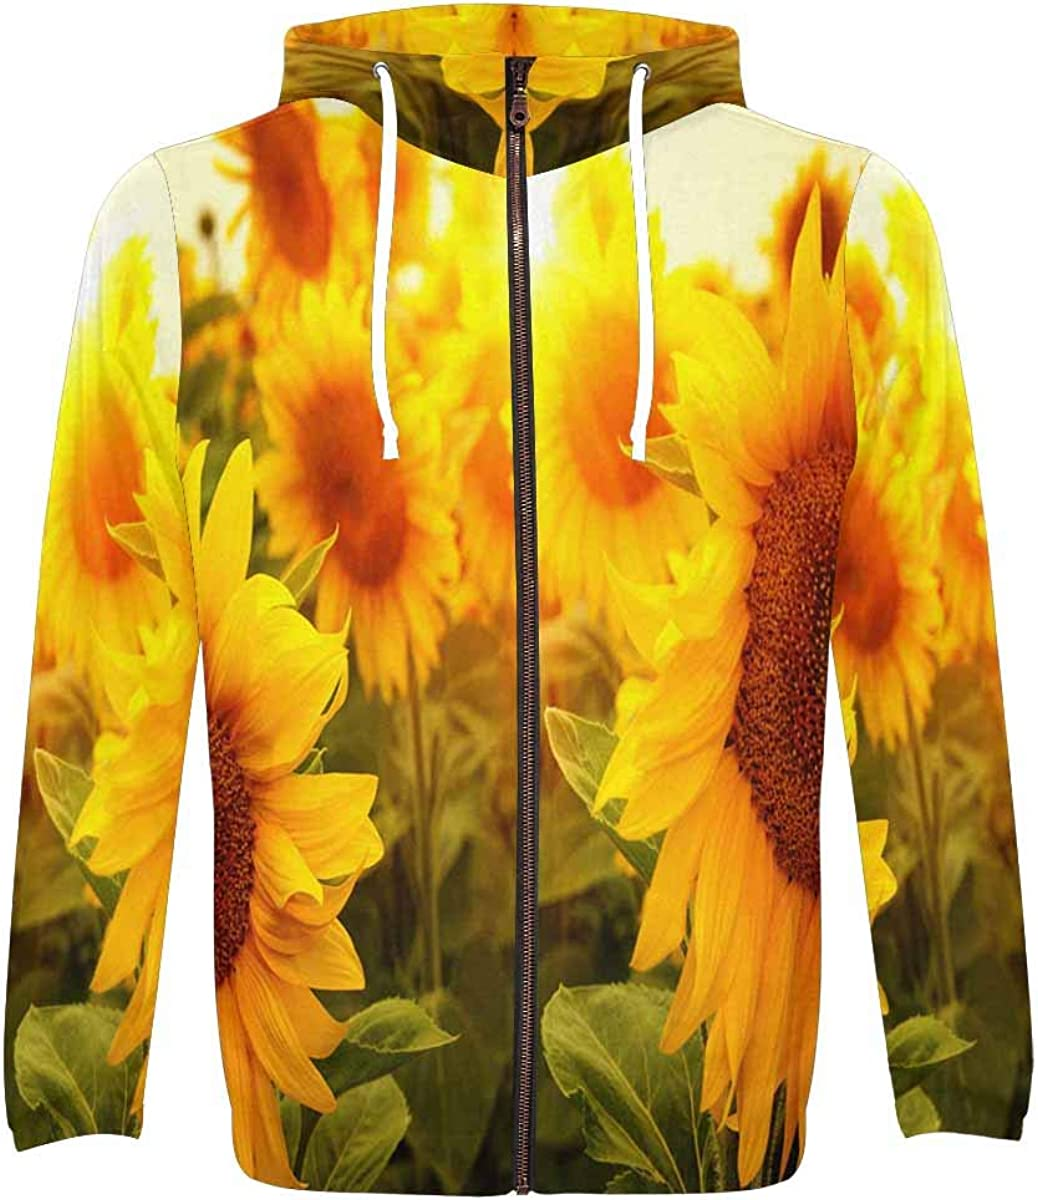 Max 41% OFF InterestPrint Men's Front Pocket Selling Pullover Zip Full Field Hoodie